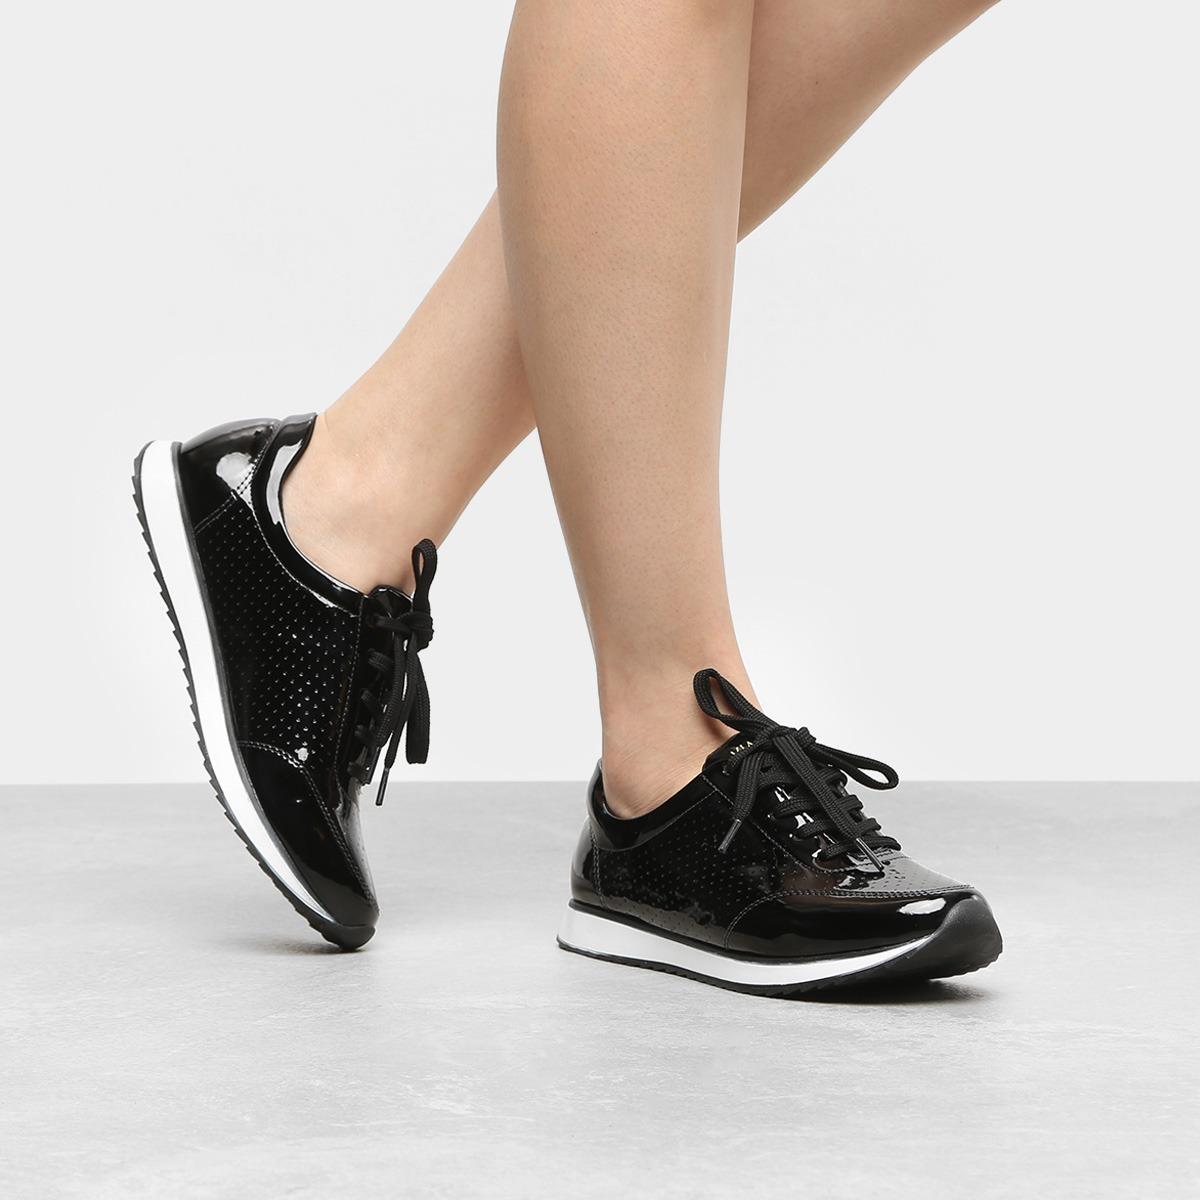 313c6727c tênis feminino via uno jogging verniz black cadarço oxford. Carregando zoom.